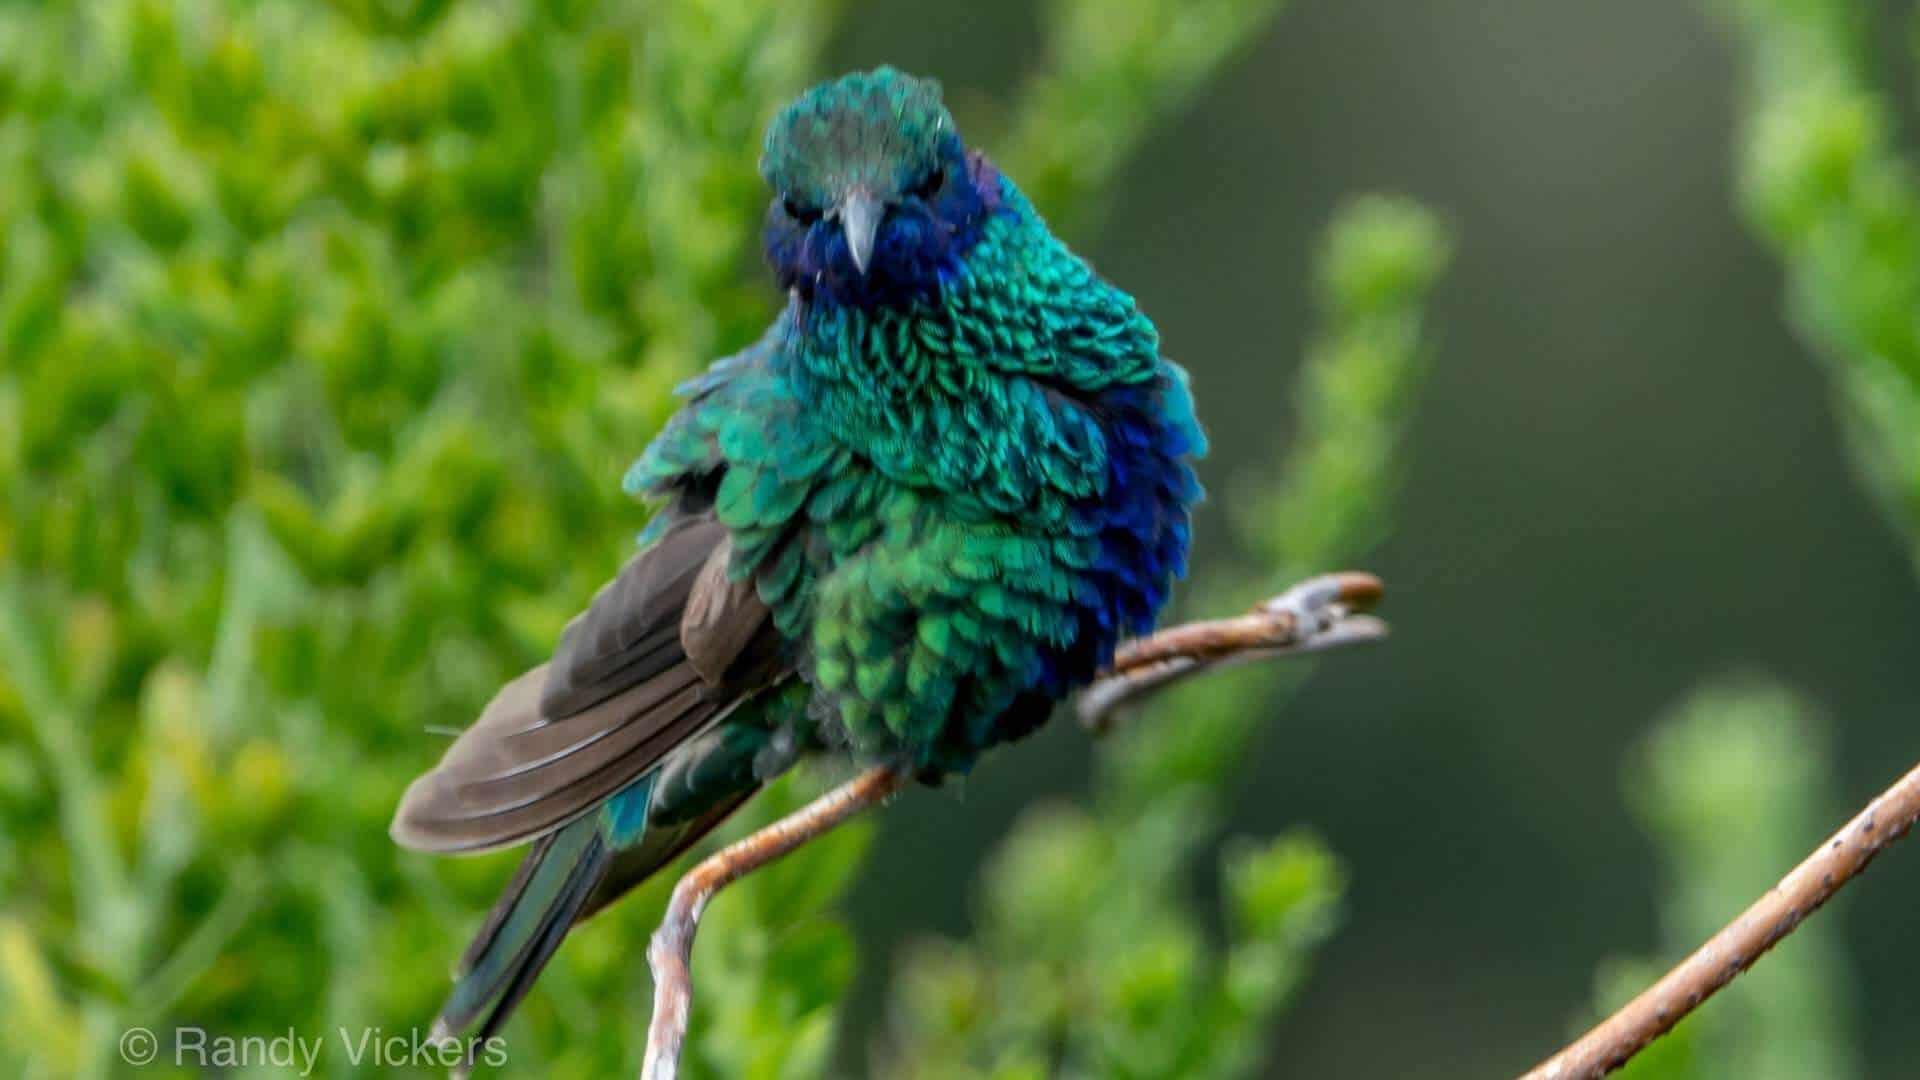 green and blue hummingbird sitting on a branch antisana ecuador